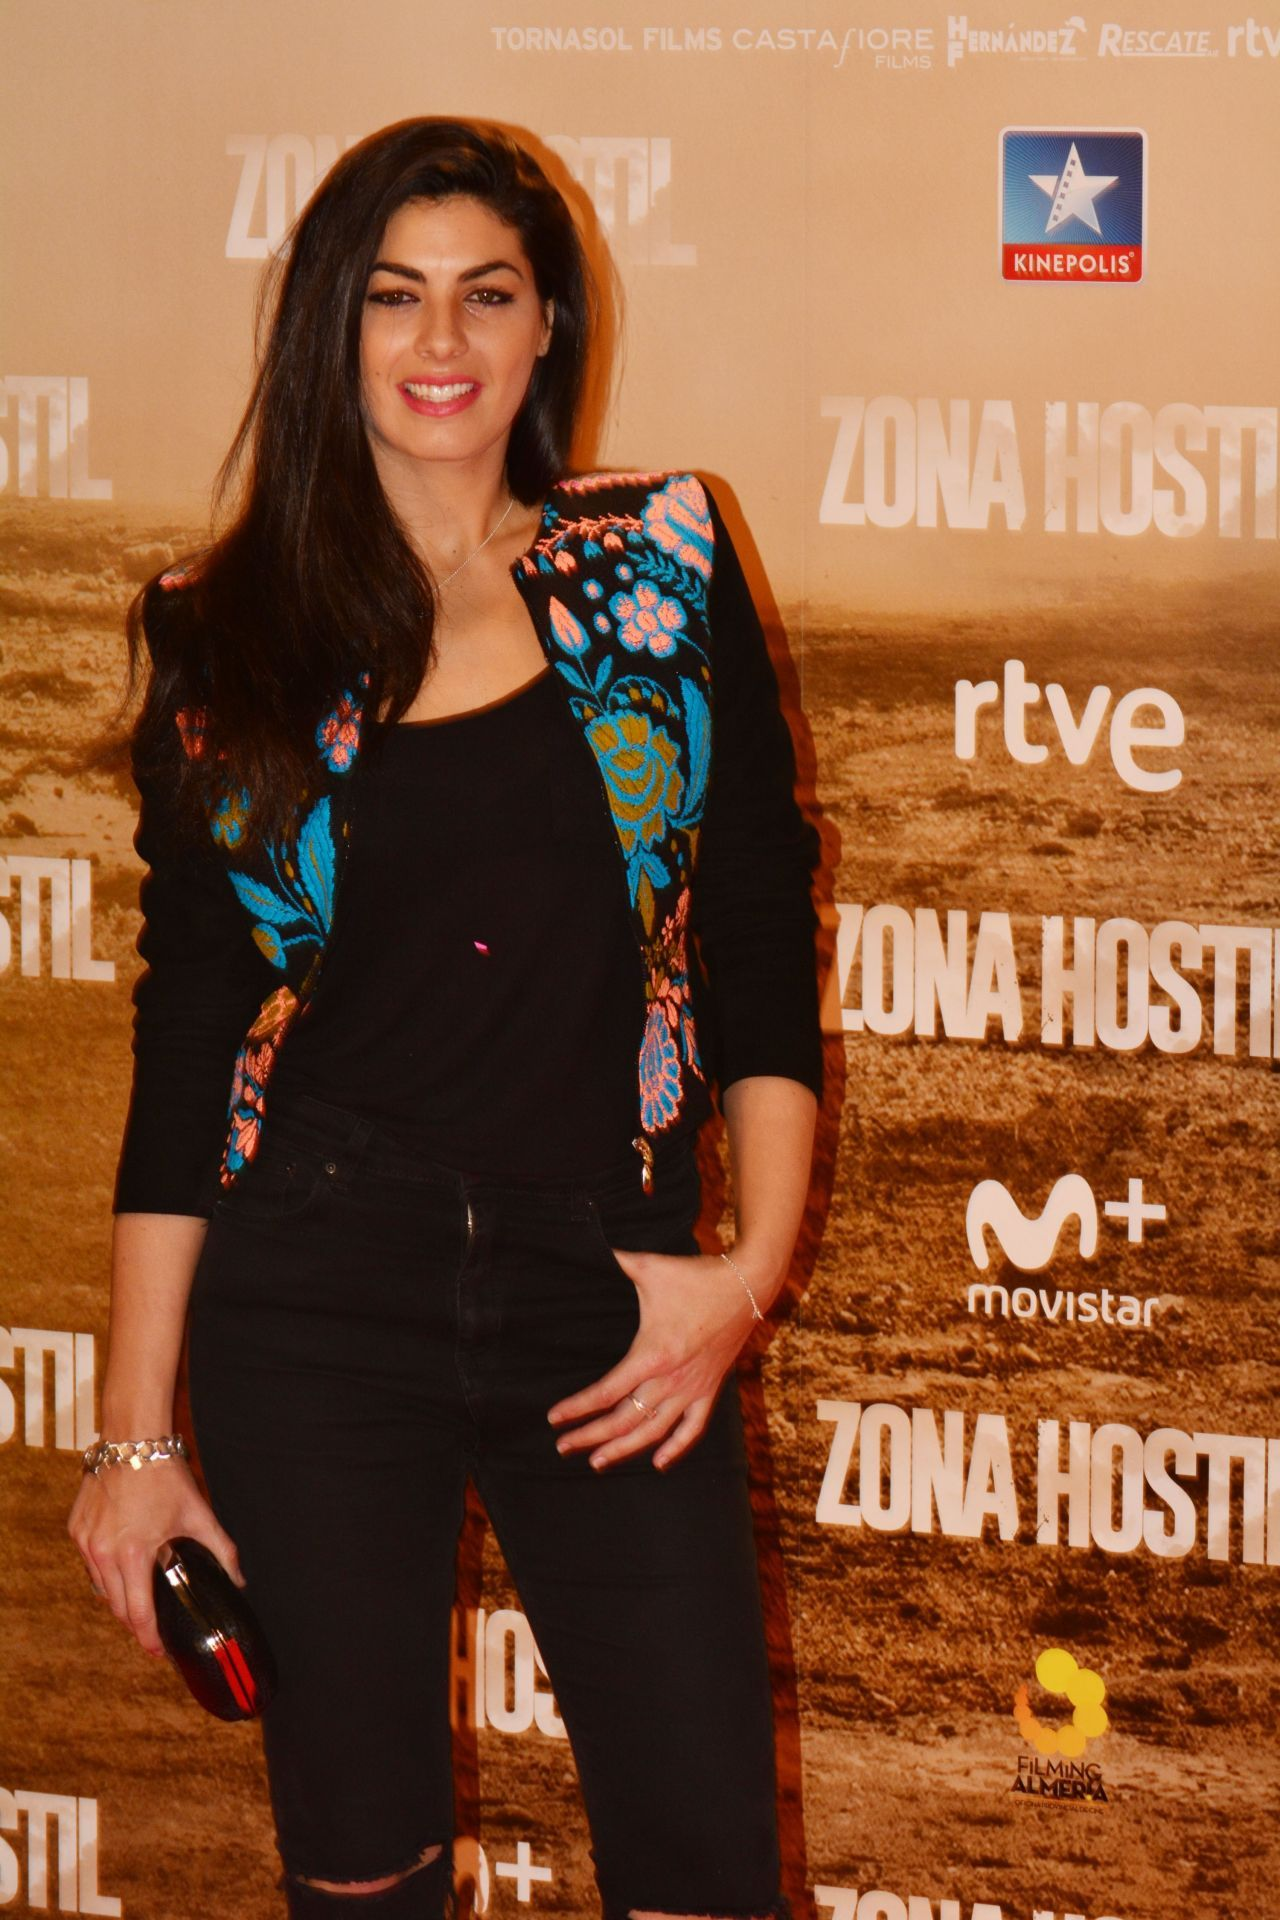 Nya de la Rubia  #NyadelaRubia Zona Hostil Premiere in Madrid 09/03/2017 Celebstills N Nya de la Rubia